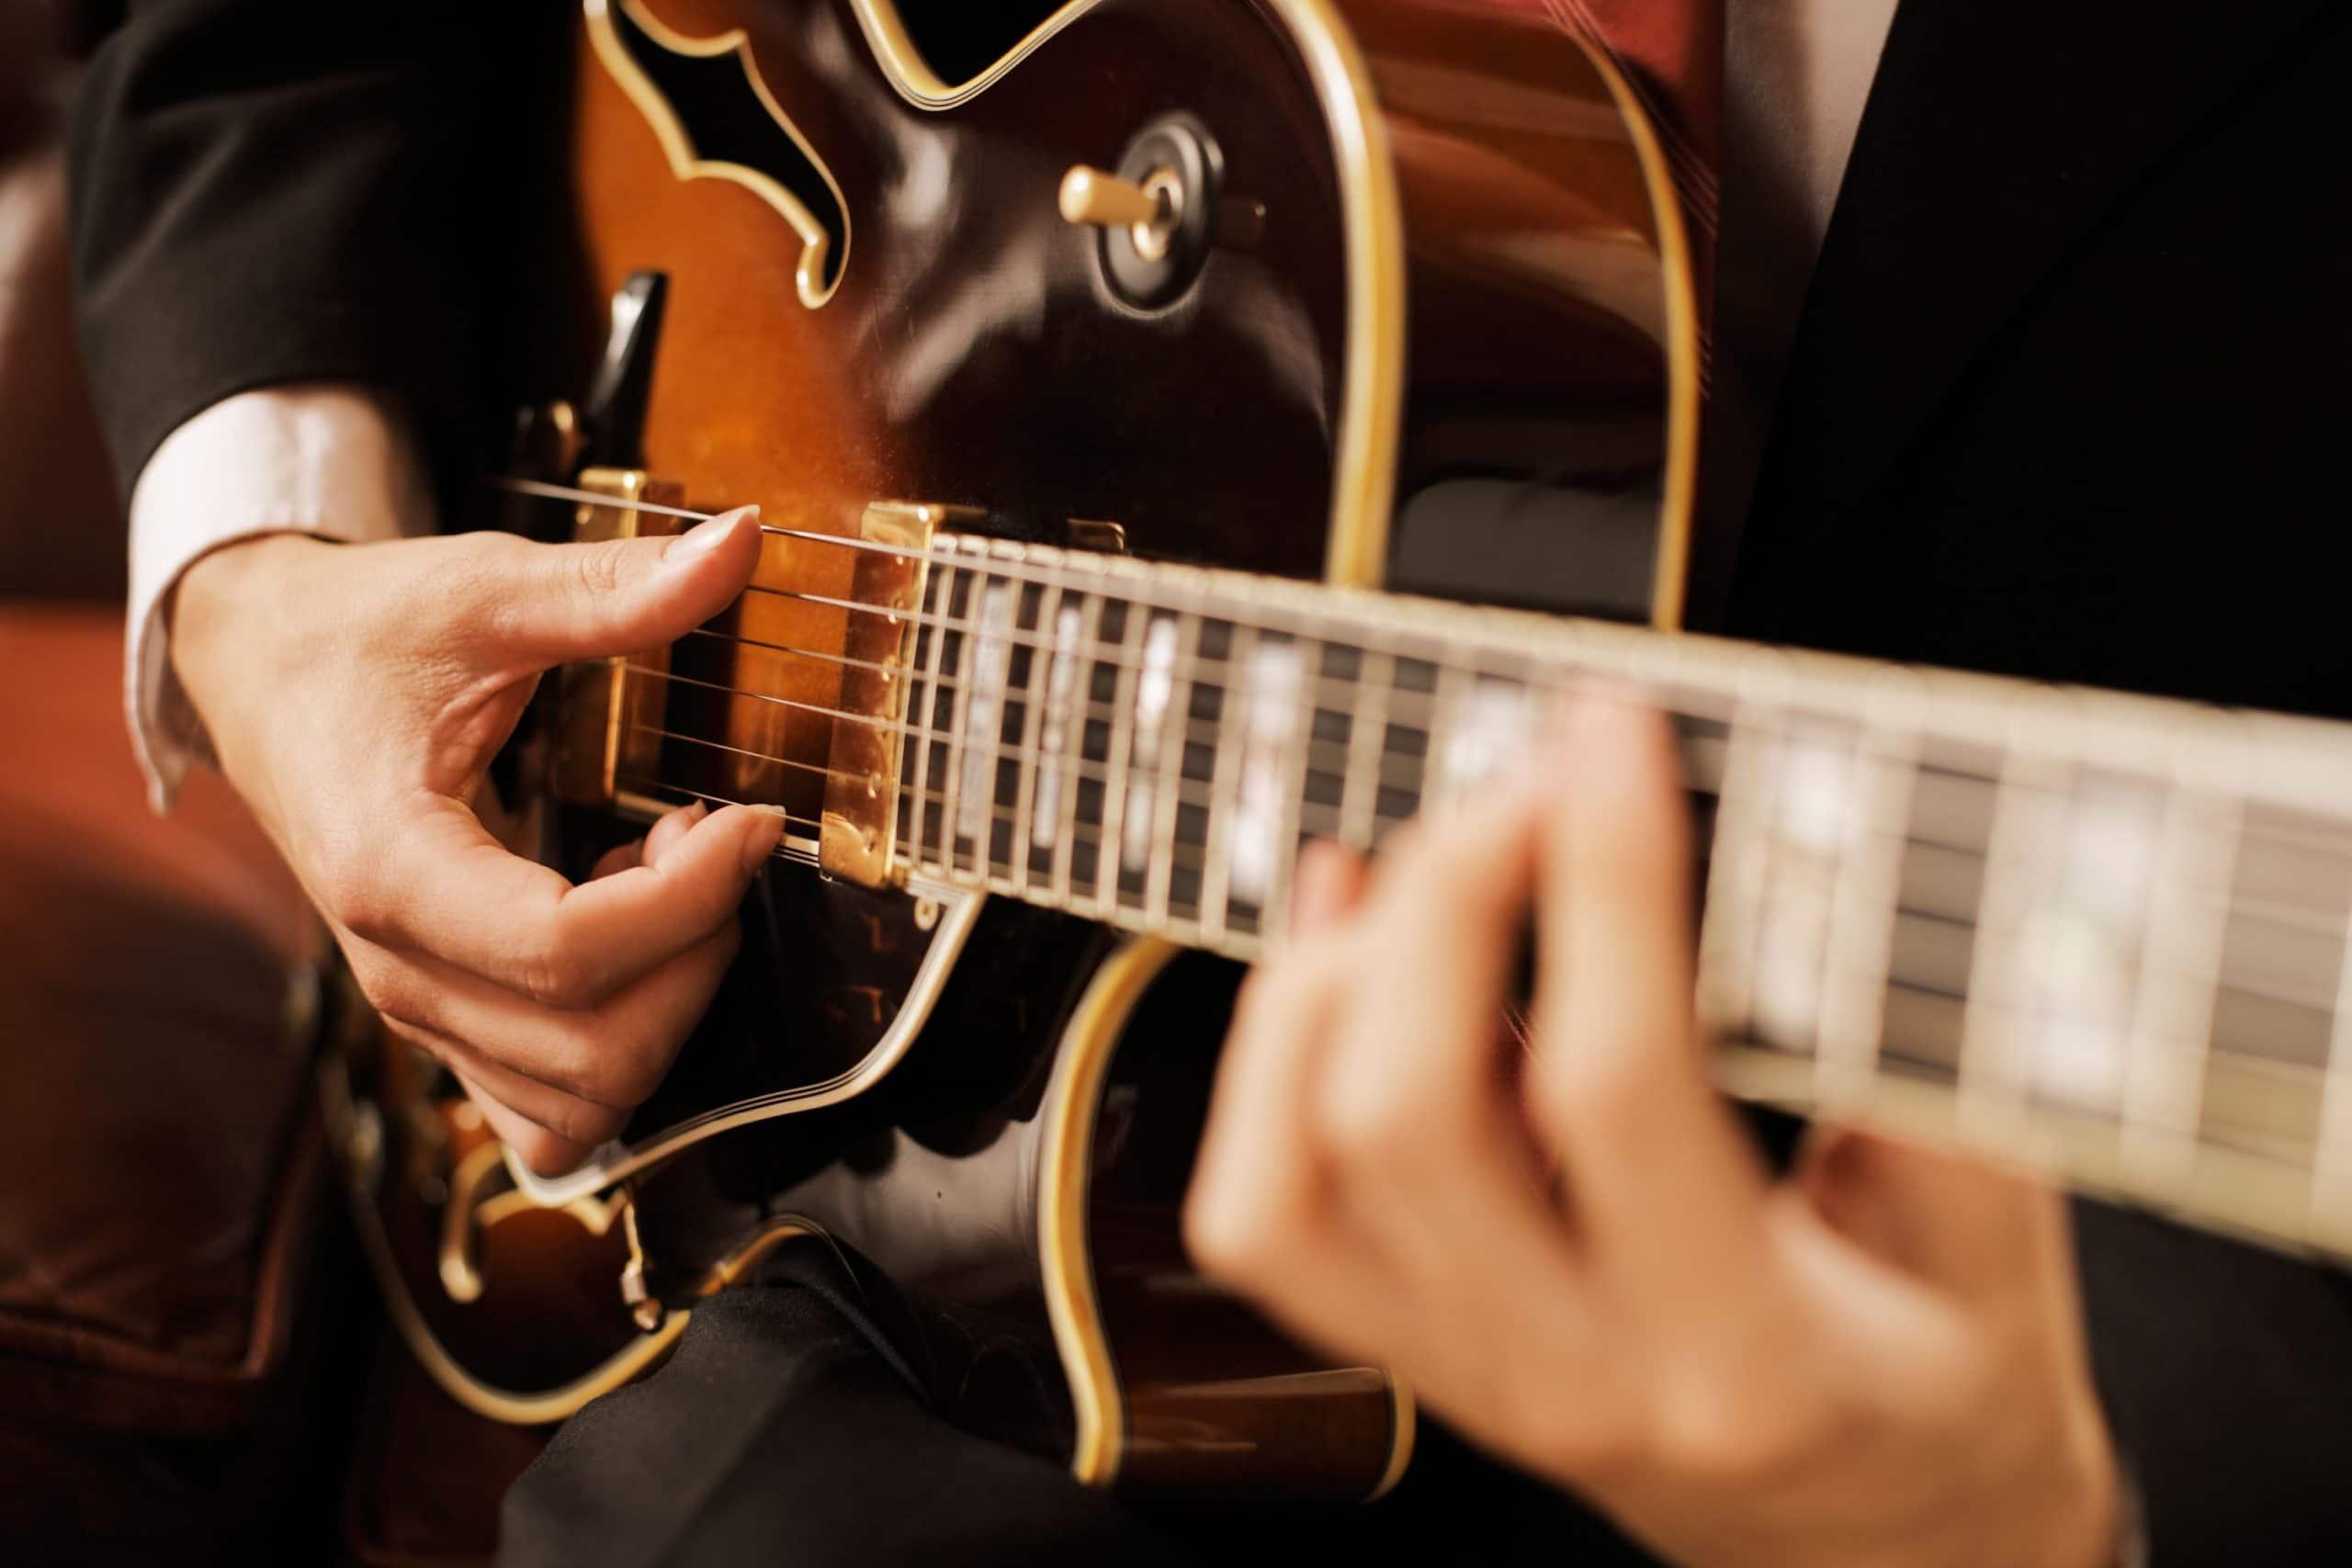 How To Start Getting Into Jazz Guitar 10 Tips The Secret Teacher Dounloadable Courses For Beginners Beginner